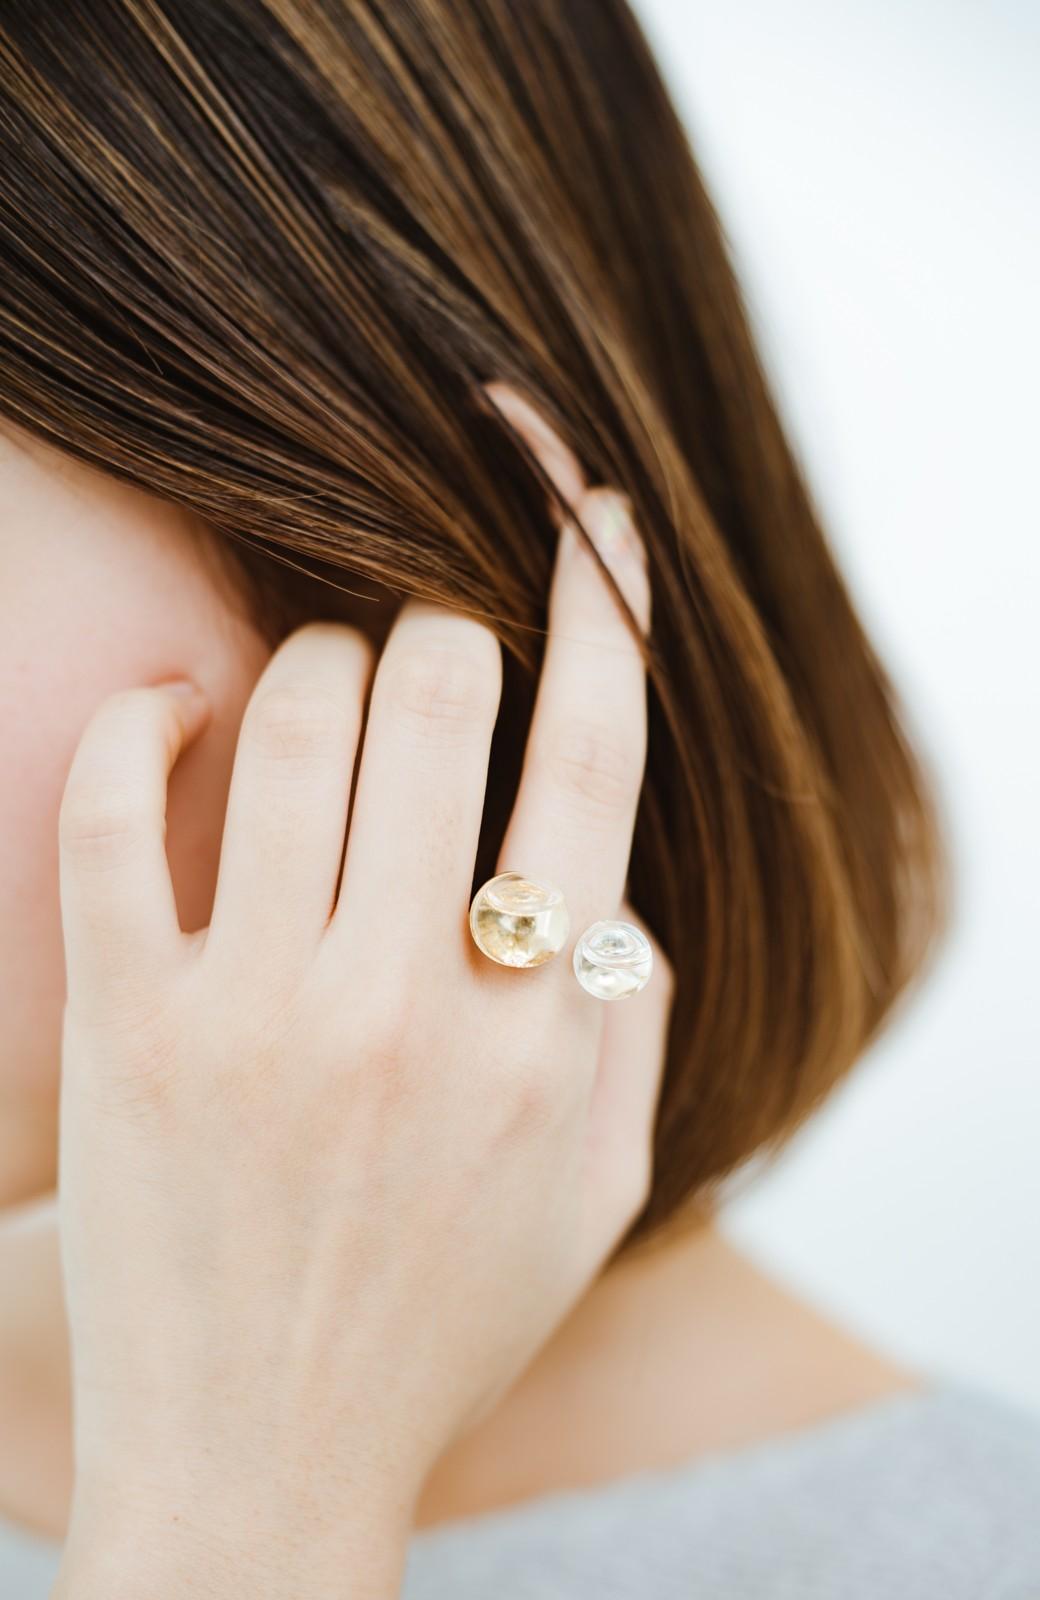 haco! てとひとて KANA MATSUNAMI チャリティー企画 W Glass dome リング <ゴールド>の商品写真7